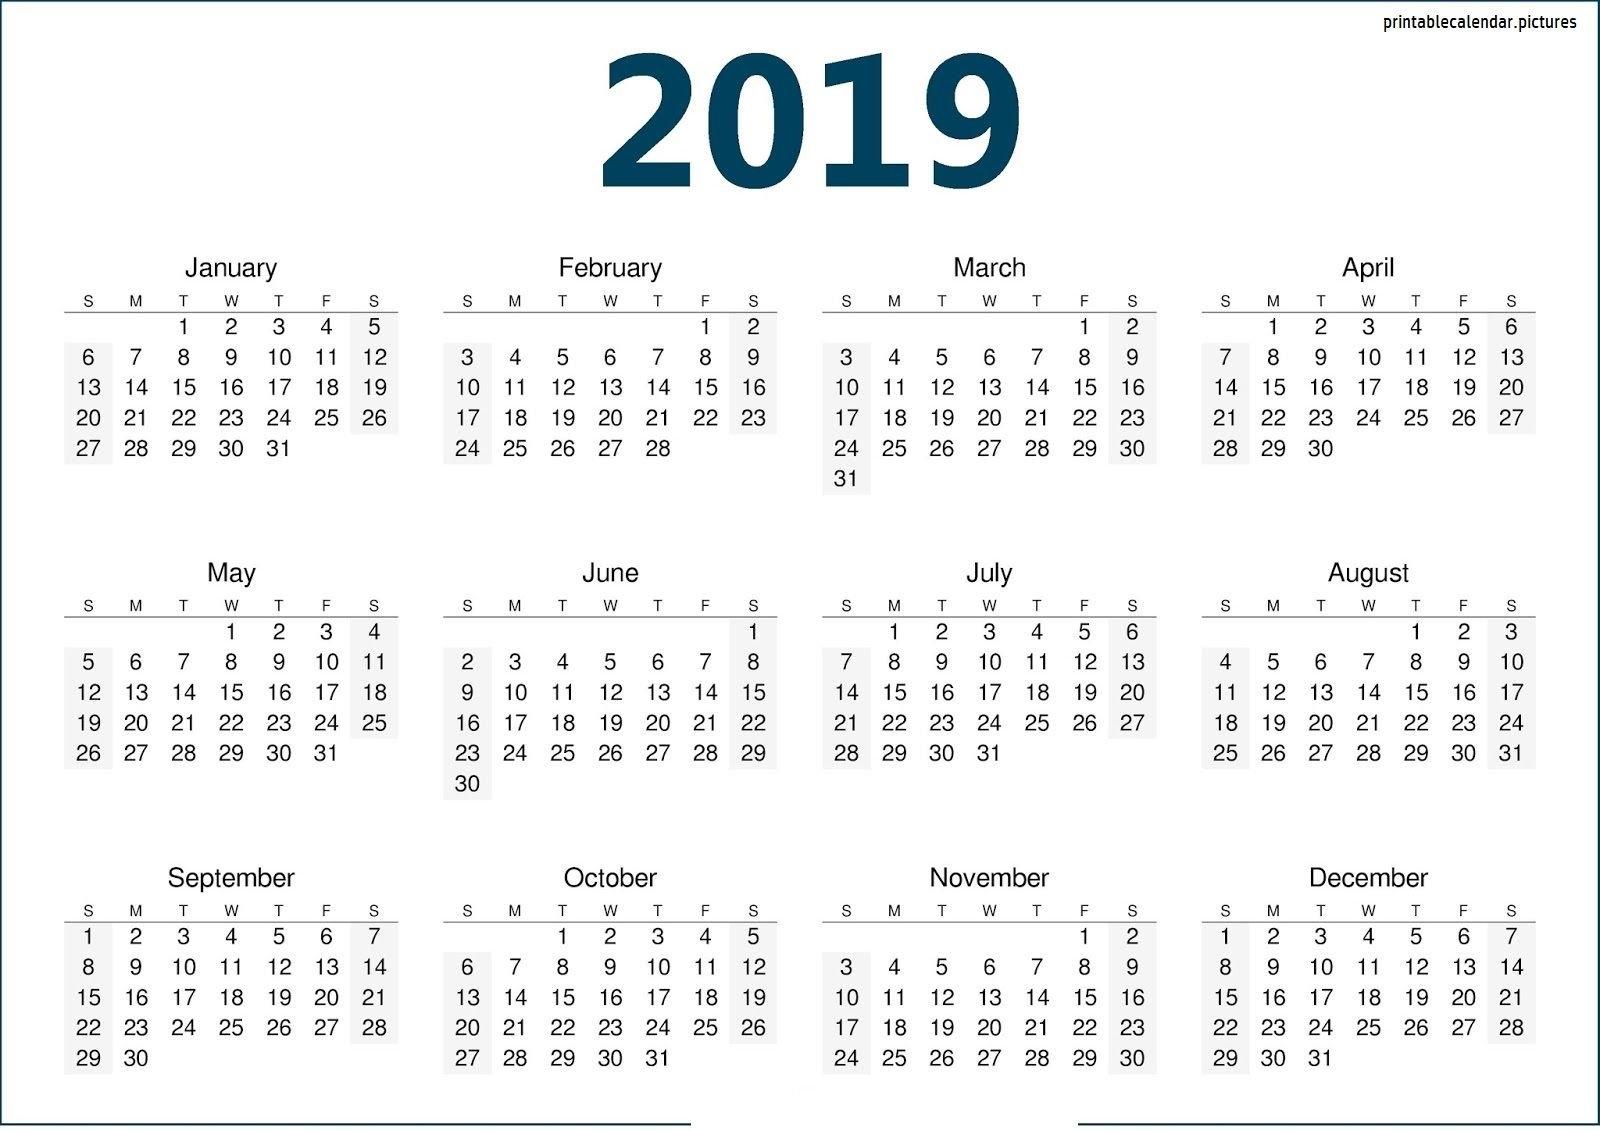 Calendar Template 2019 | Calendar Template 2019 | Calendar, 2019 Discover 5 Calendar 2019